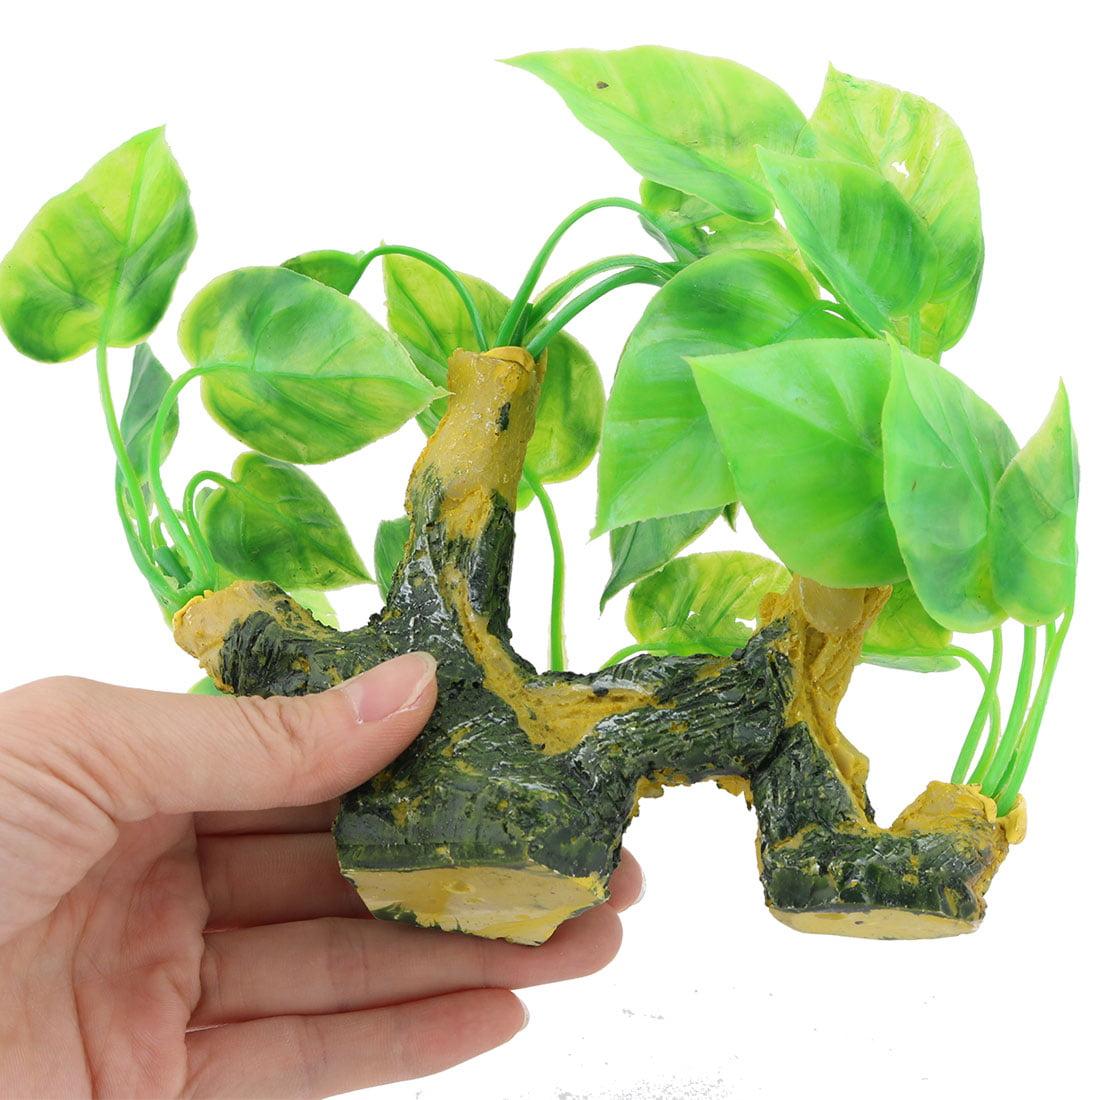 Aquarium Ceramic Base Plastic Artificial Landscap Water Plant Decor Green Yellow - image 2 de 3